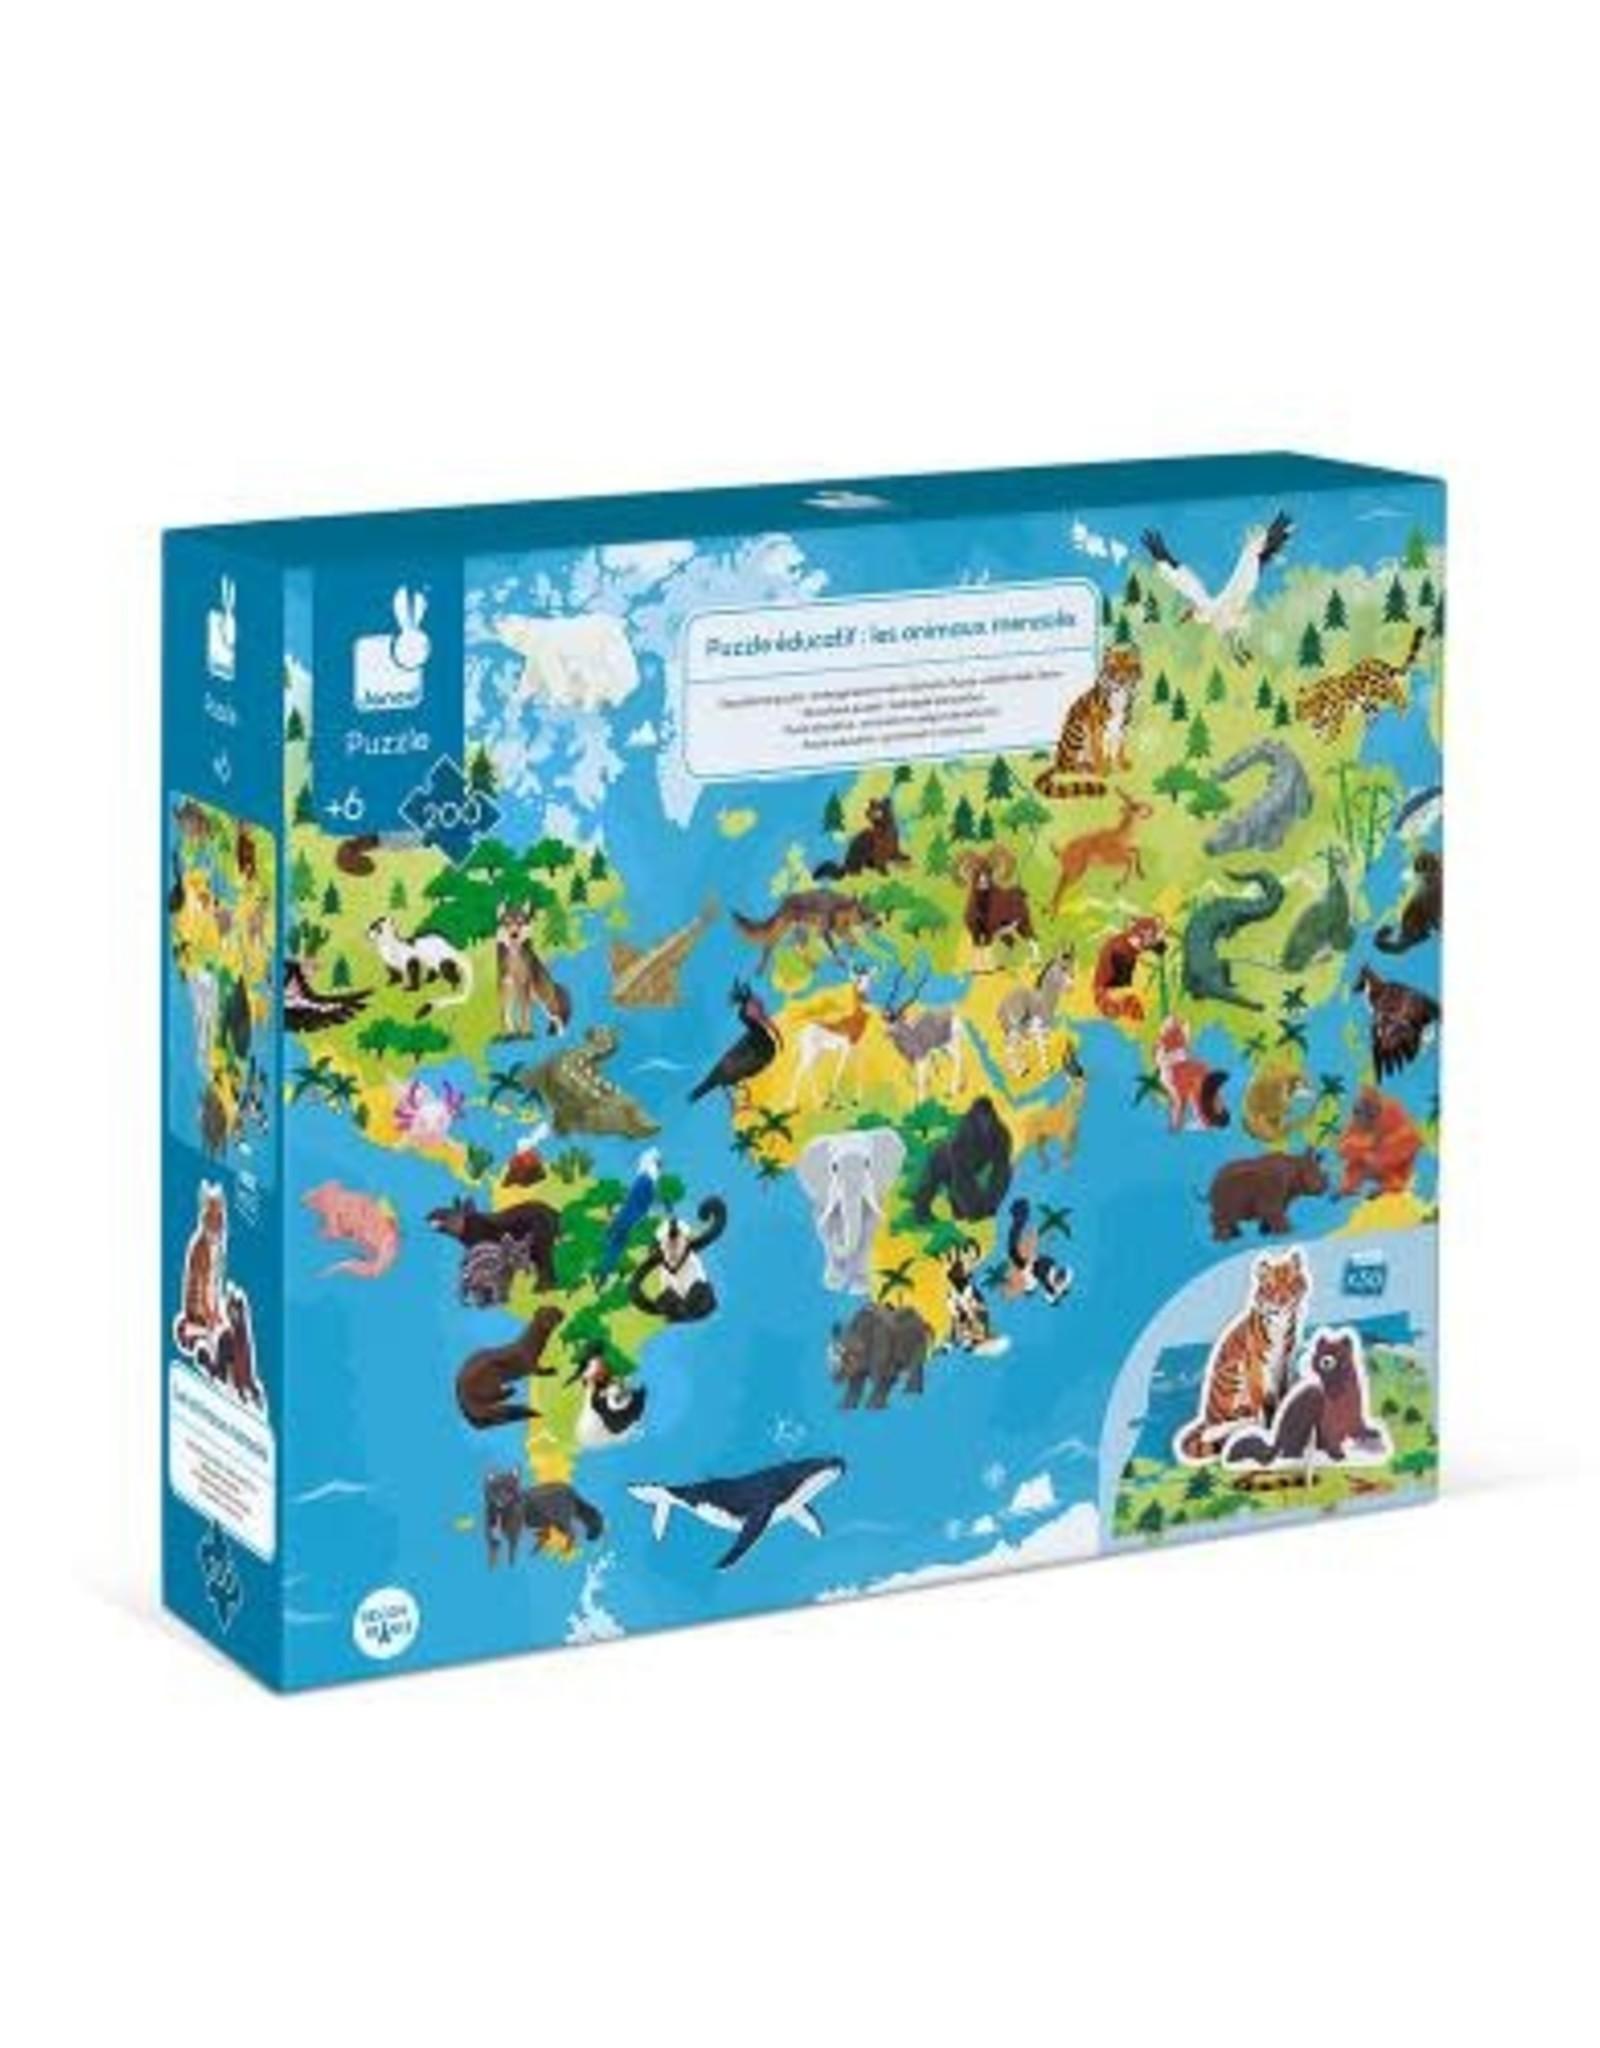 Janod Janod 3D Educational Puzzle: Endangered Animals 200pcs